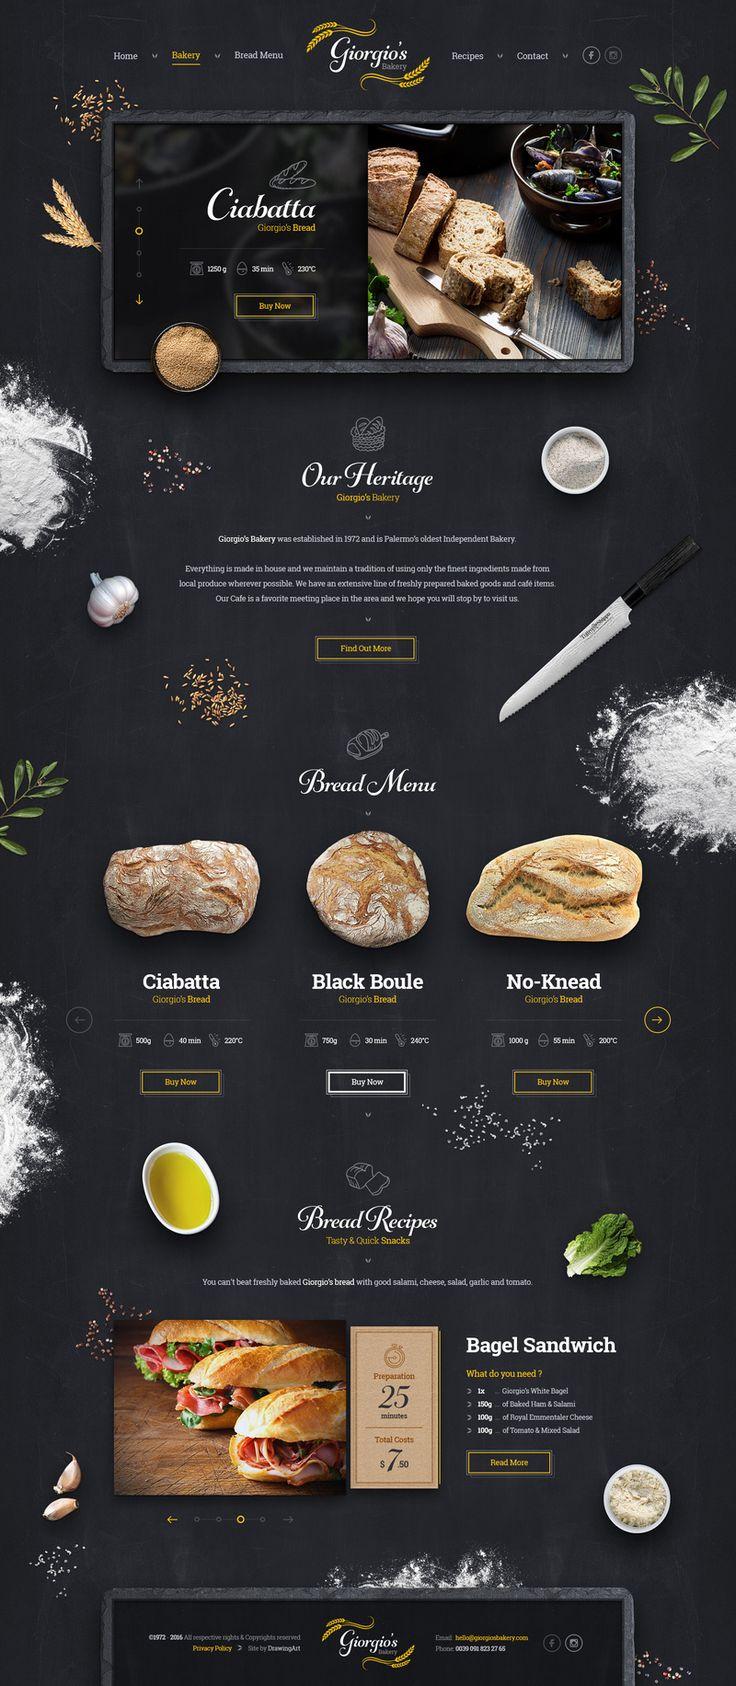 Giorgio's Bakery